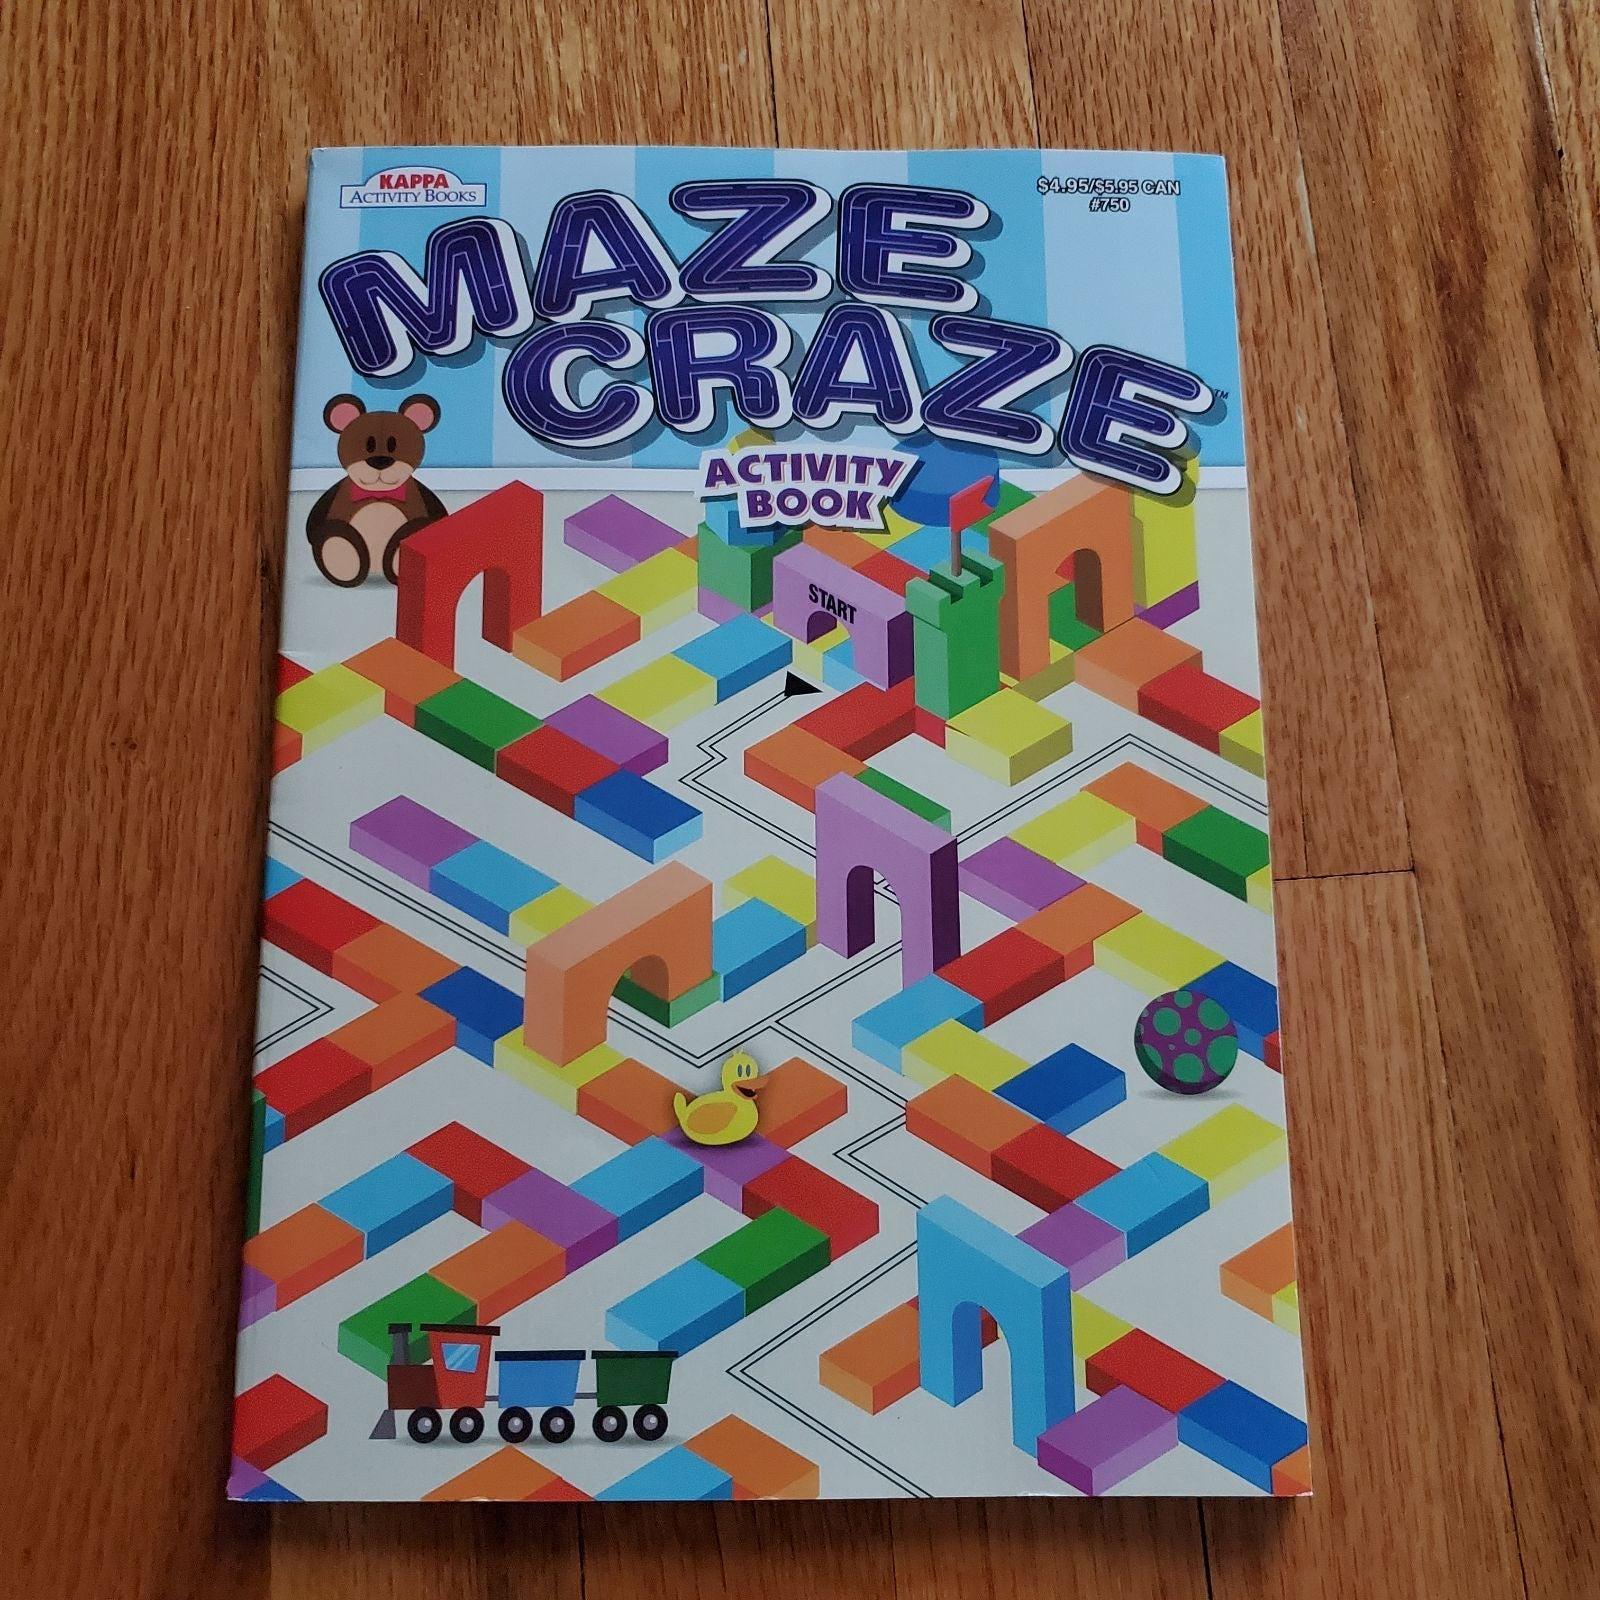 Adult Children MAZE CRAZE Coloring Book!